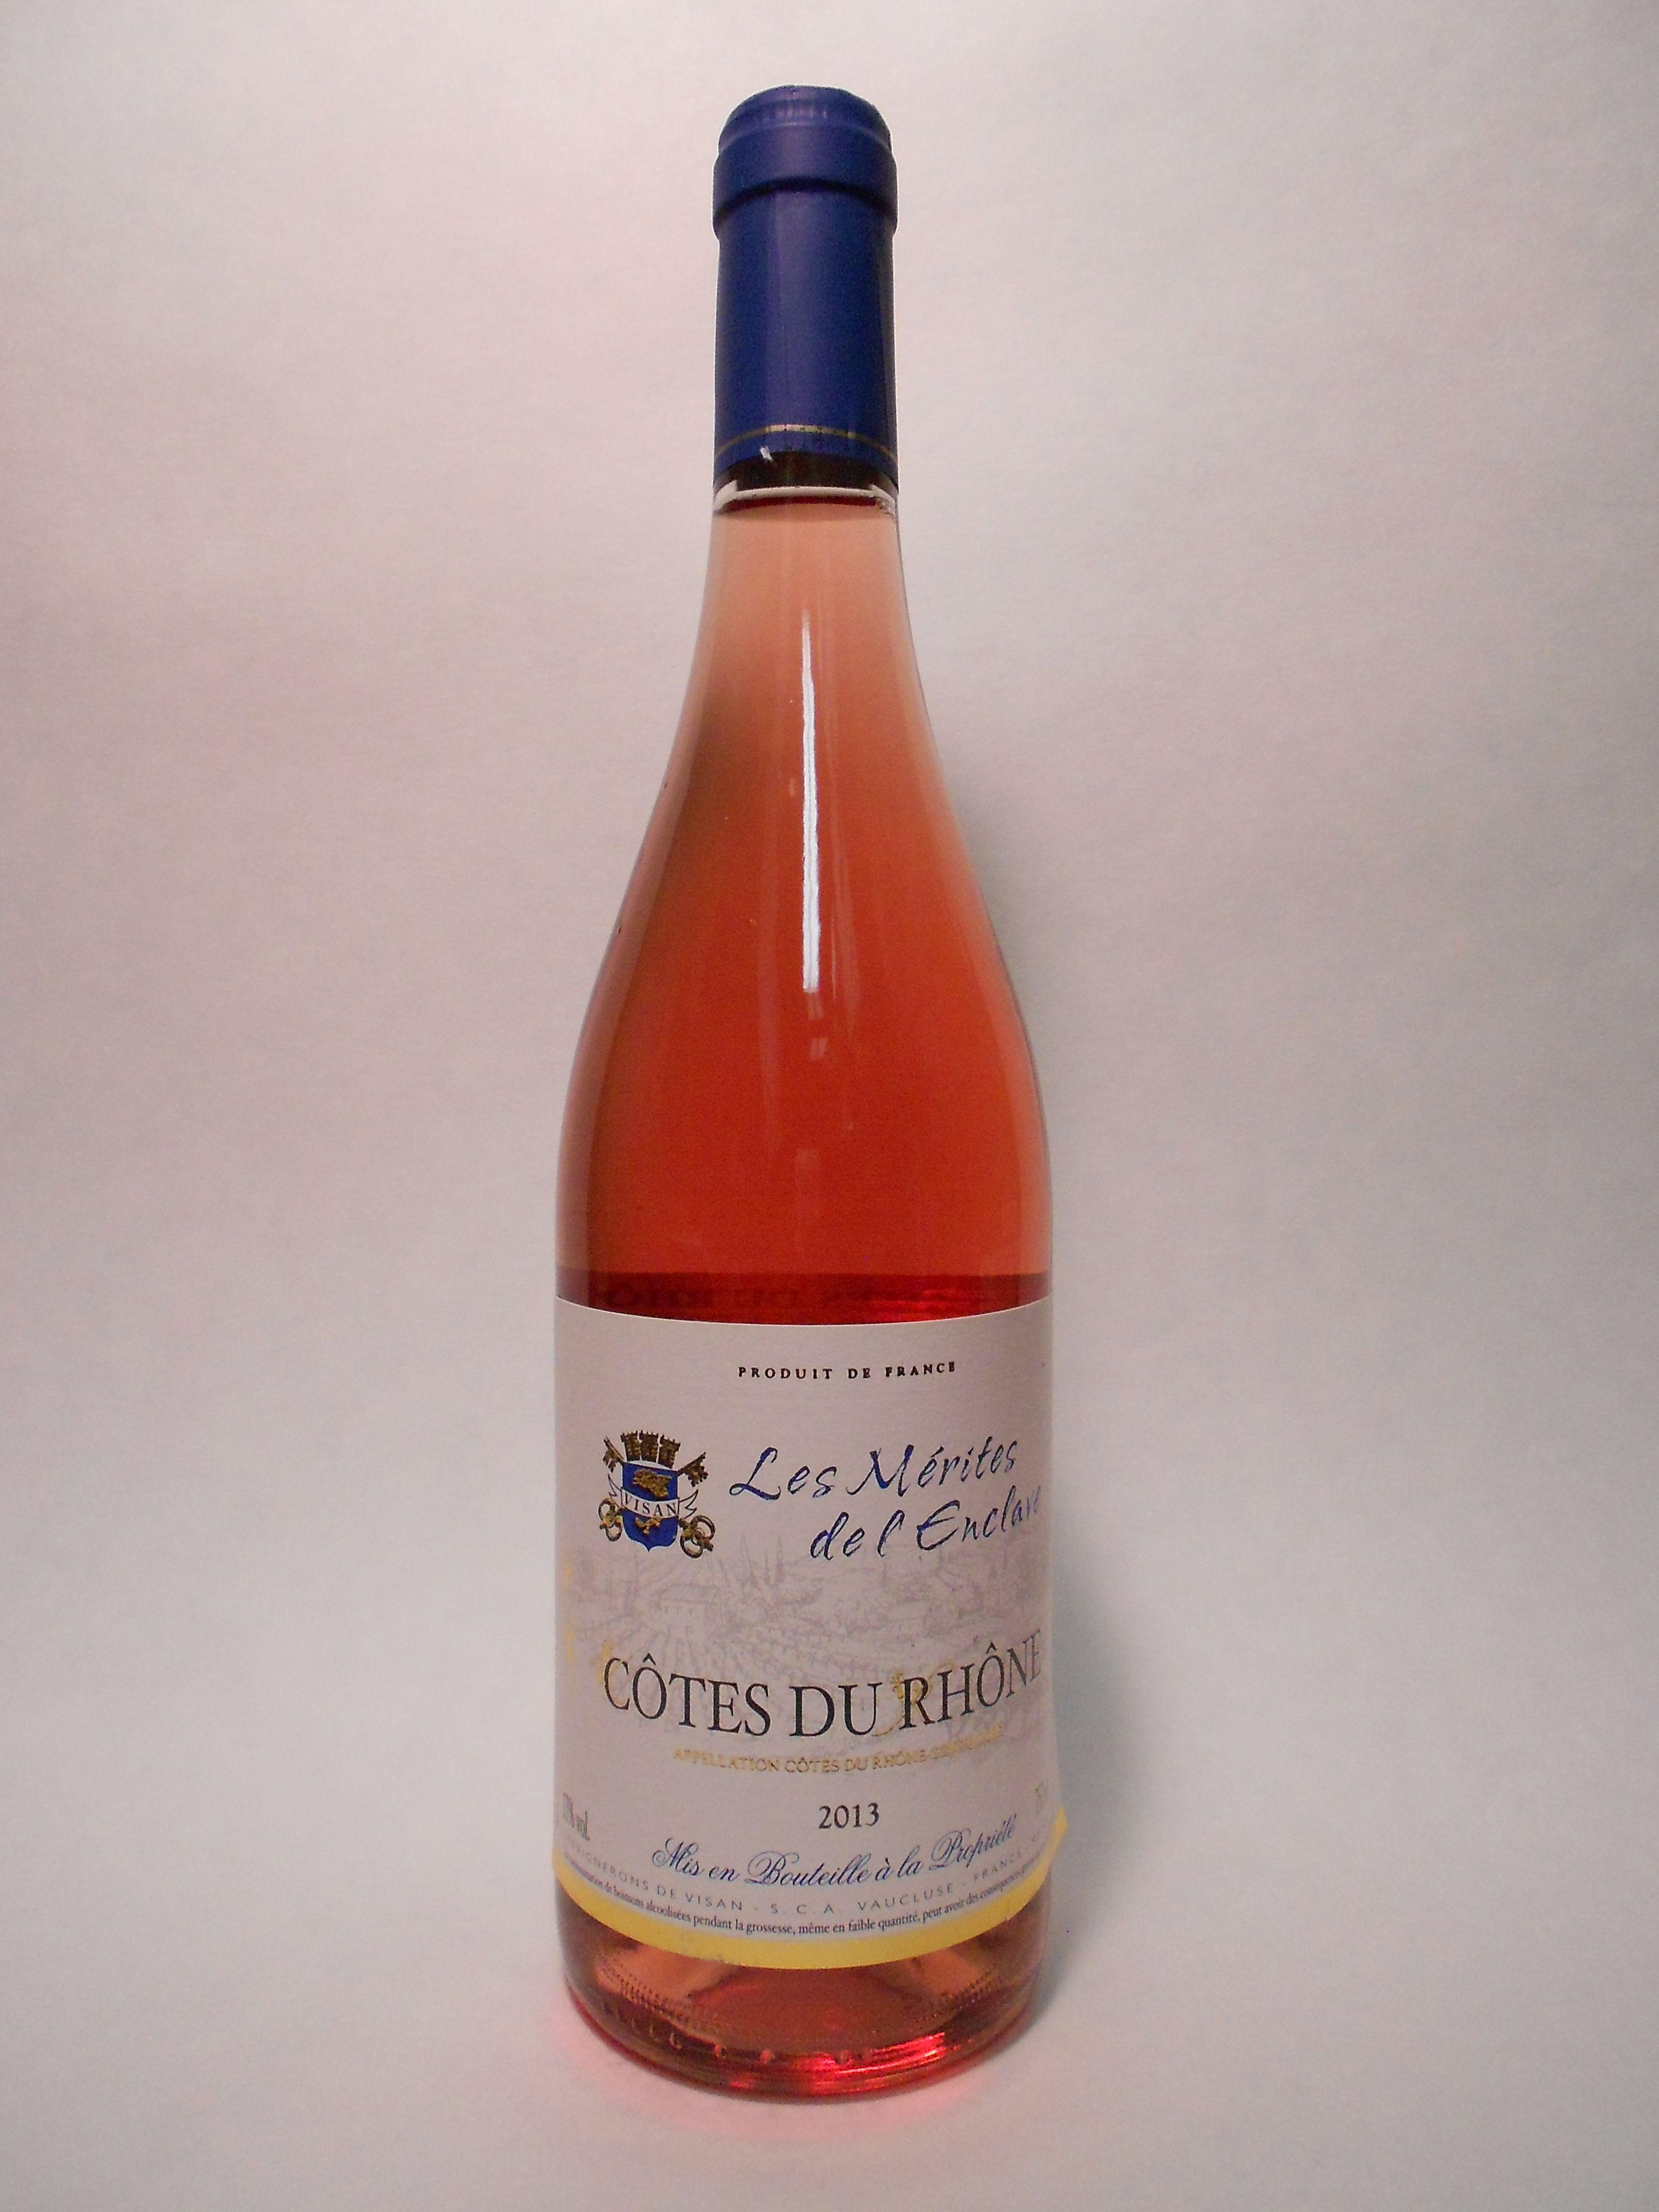 2013 Les Merites De L Enclave Cotes Du Rhone Rose Sku 62526 Www Bassins Com Phone 202 338 1433 Vino Rosado Vinos